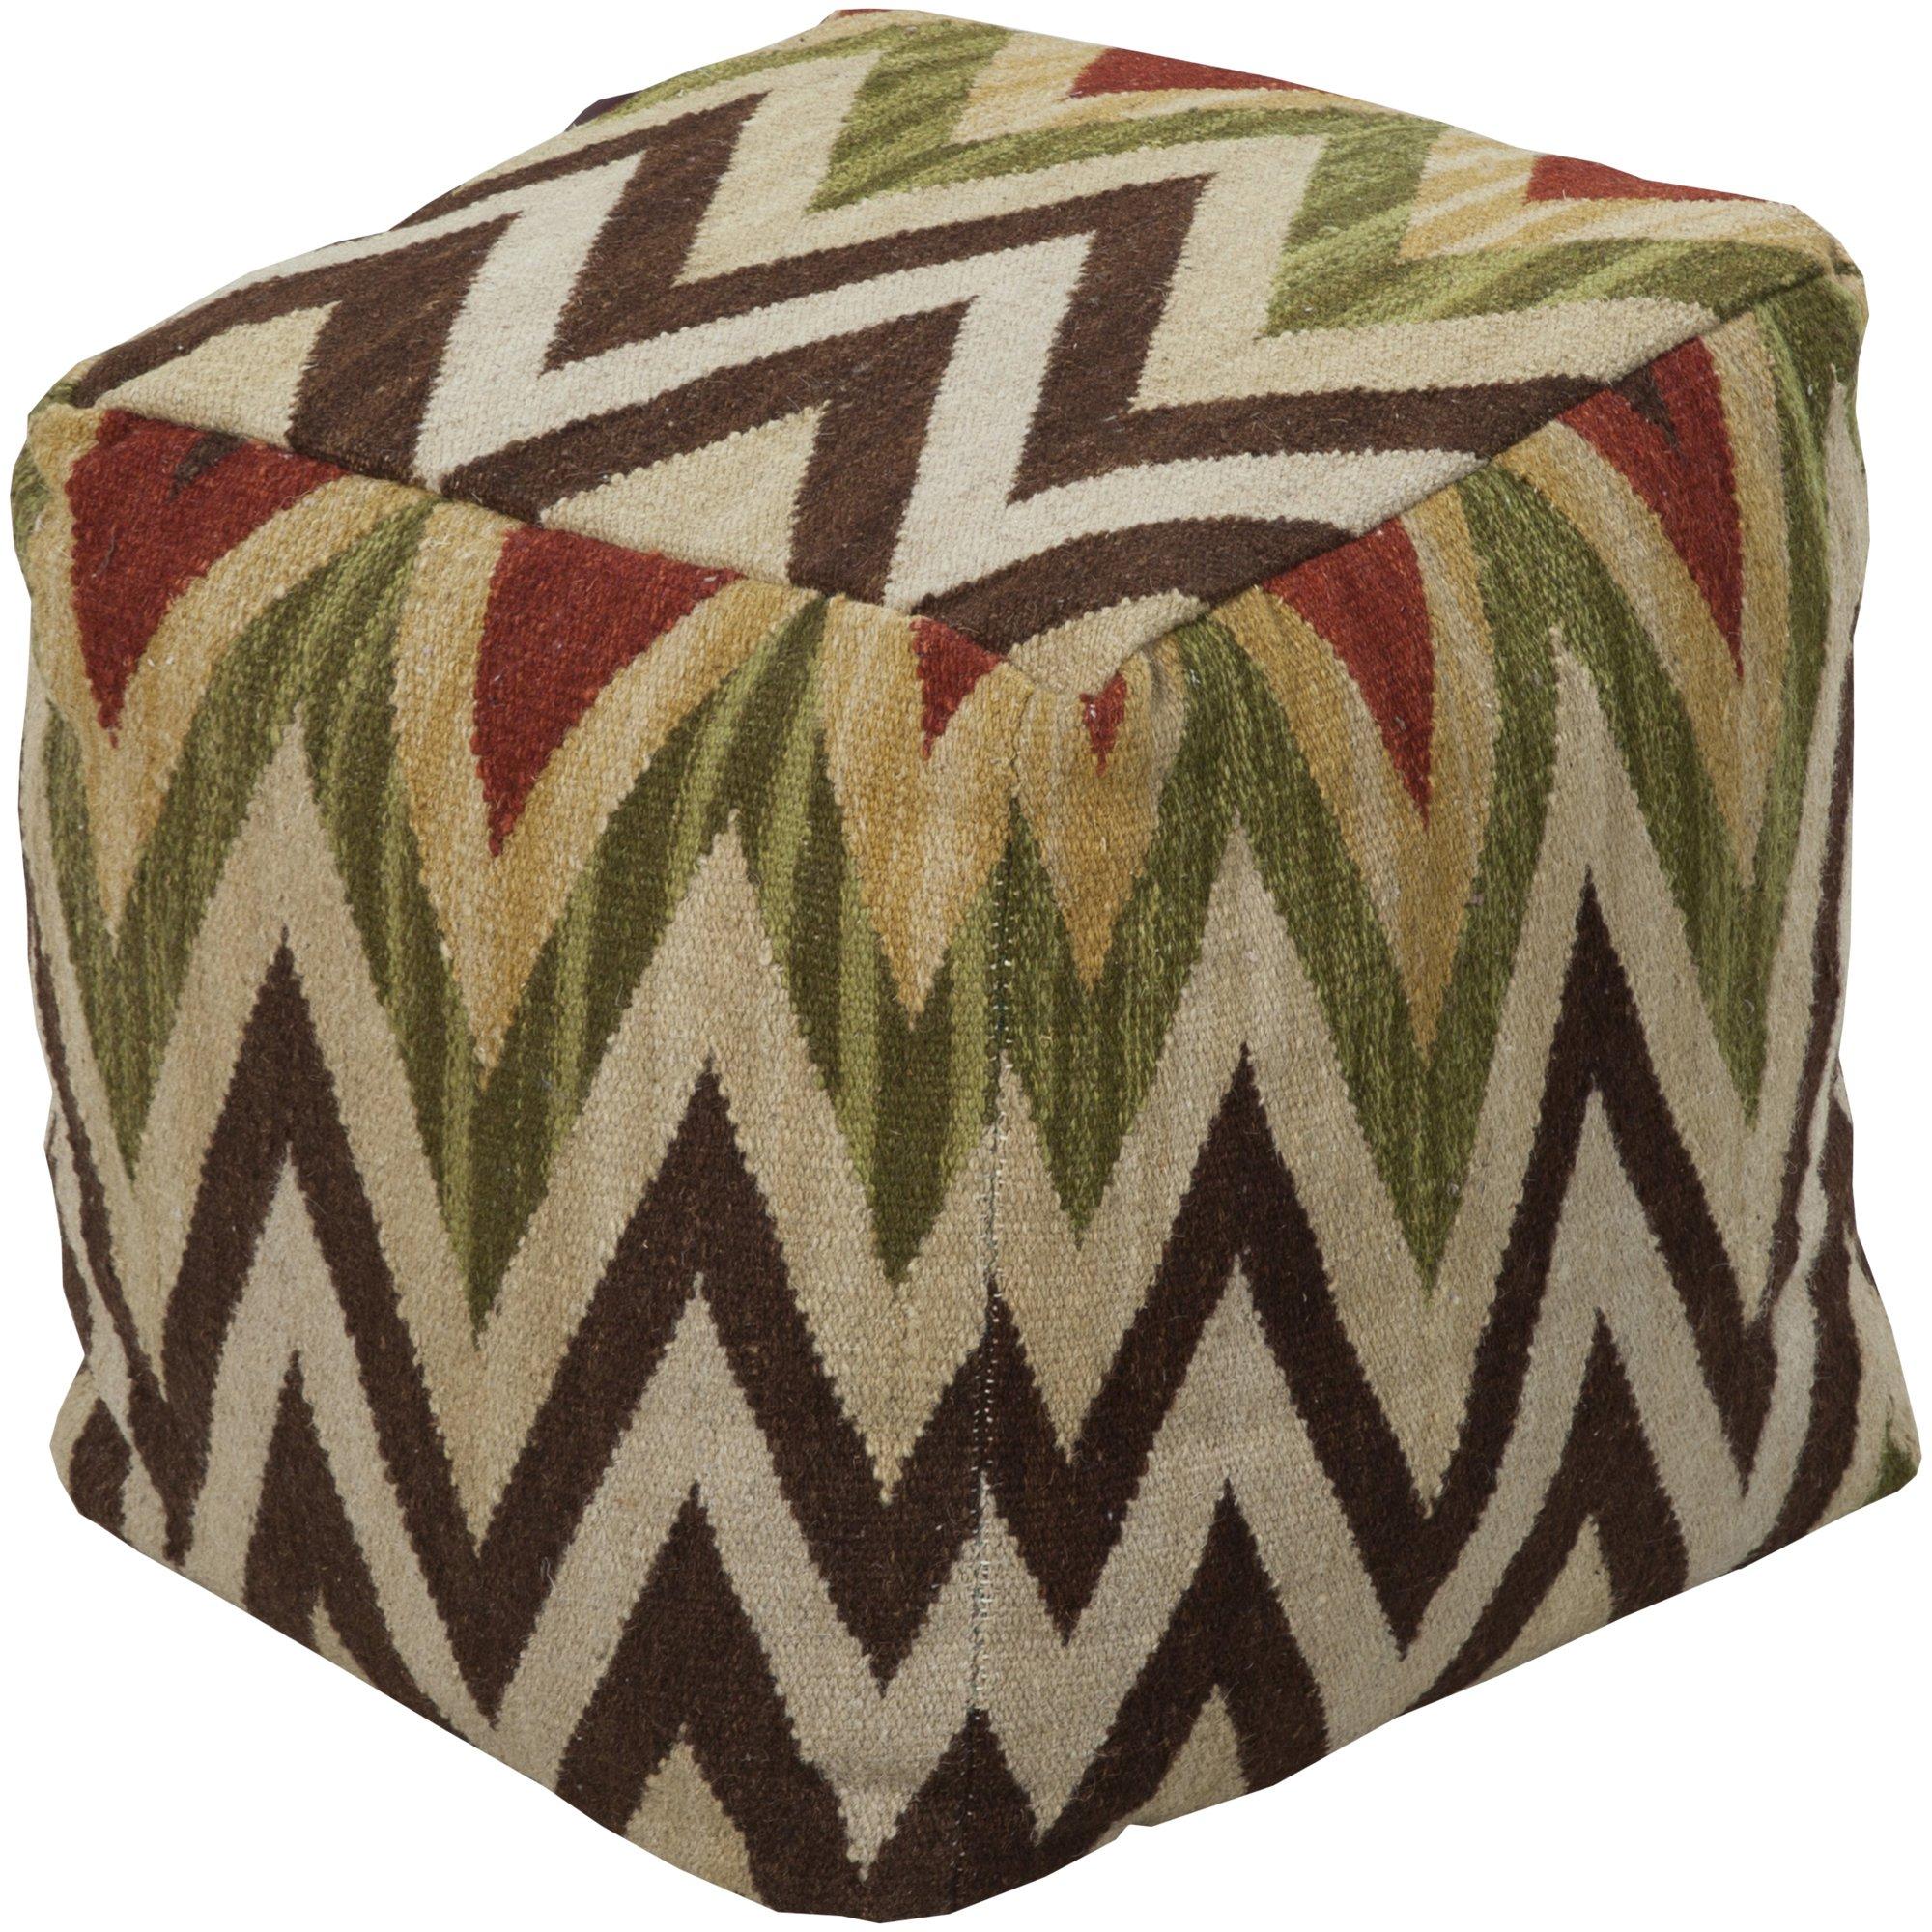 Surya POUF-32 Hand Made 80% Wool / 20% Cotton Brown 18'' x 18'' x 18'' Pouf